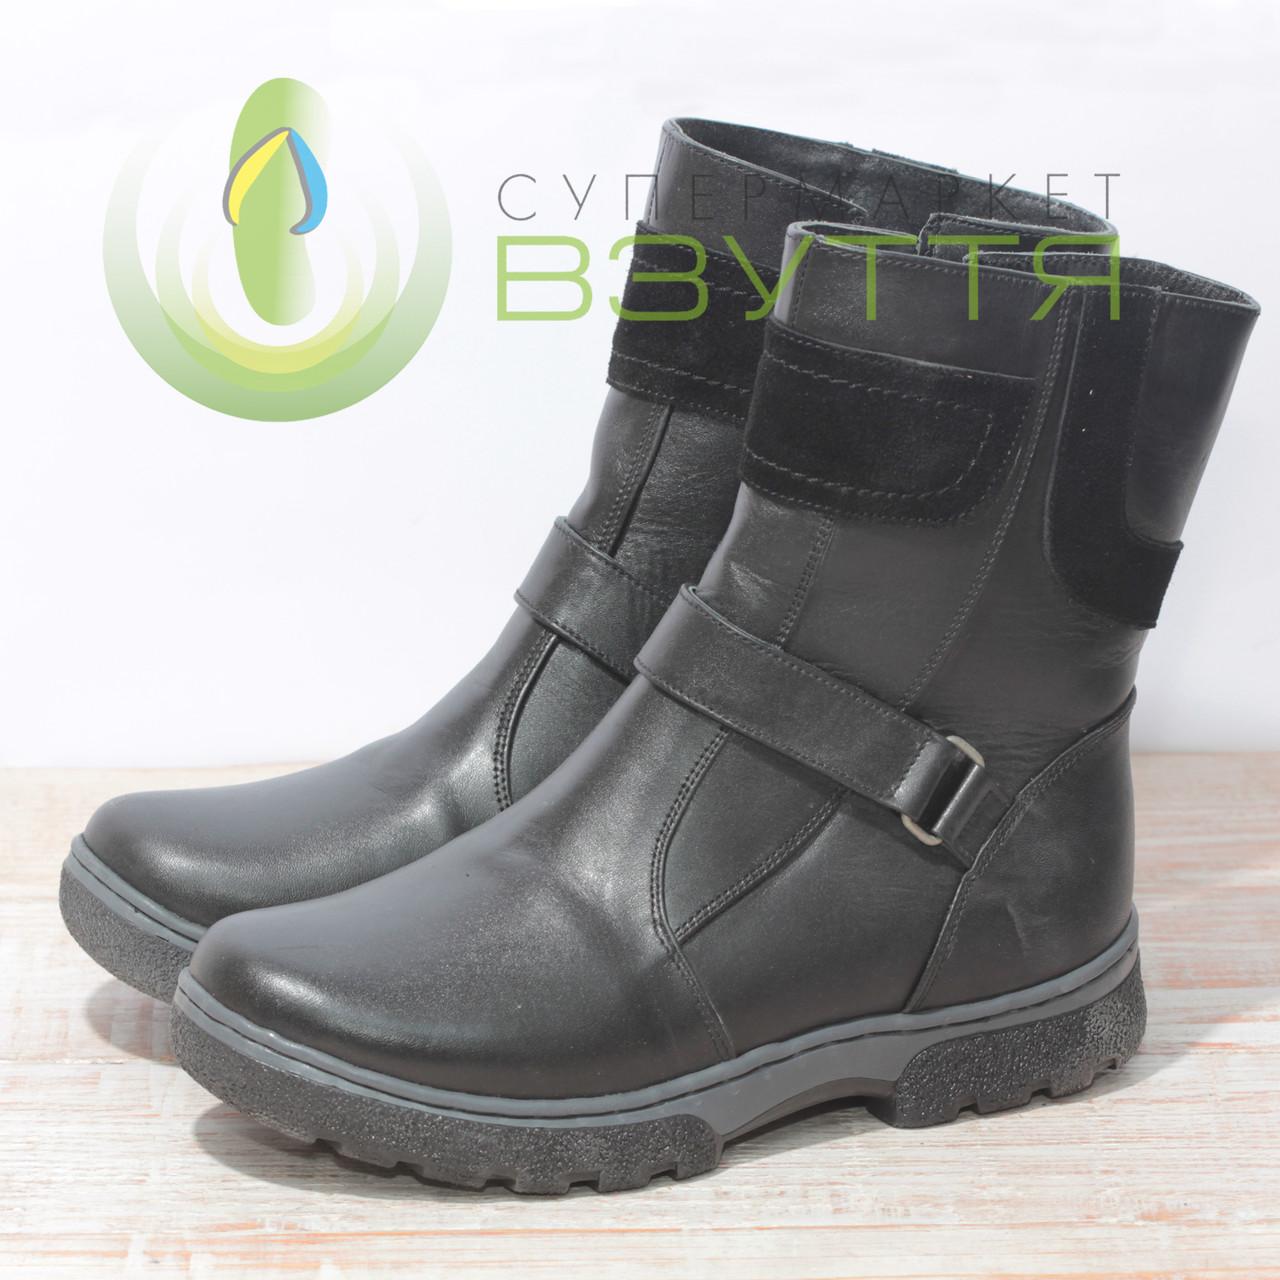 Ботинки зимние для девочки арт 84 размеры 33-34  продажа 531b63e2e2a6d